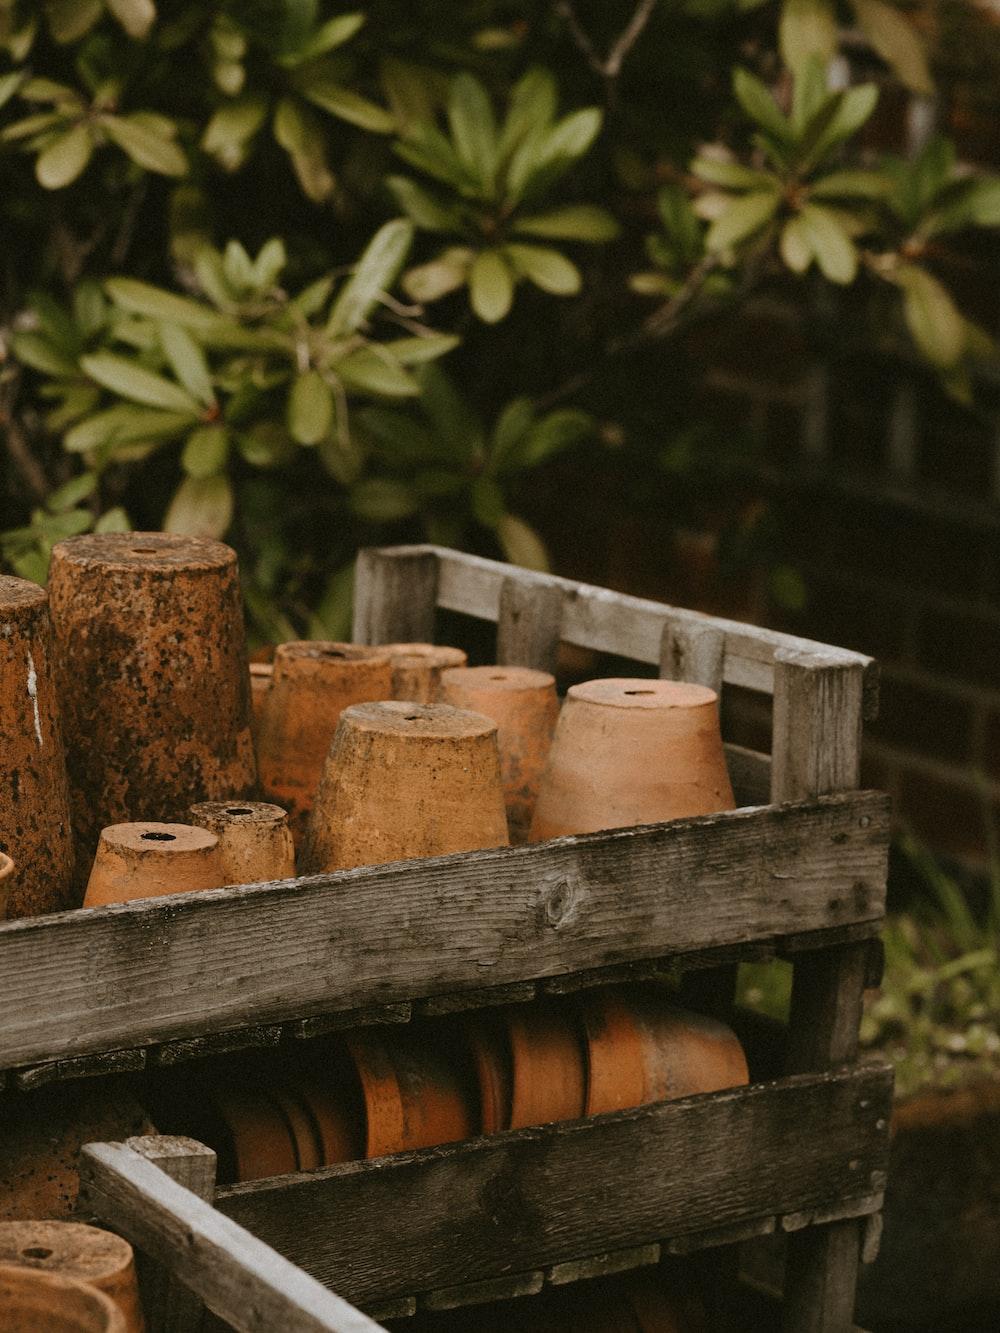 brown clay pot lot close-up photography